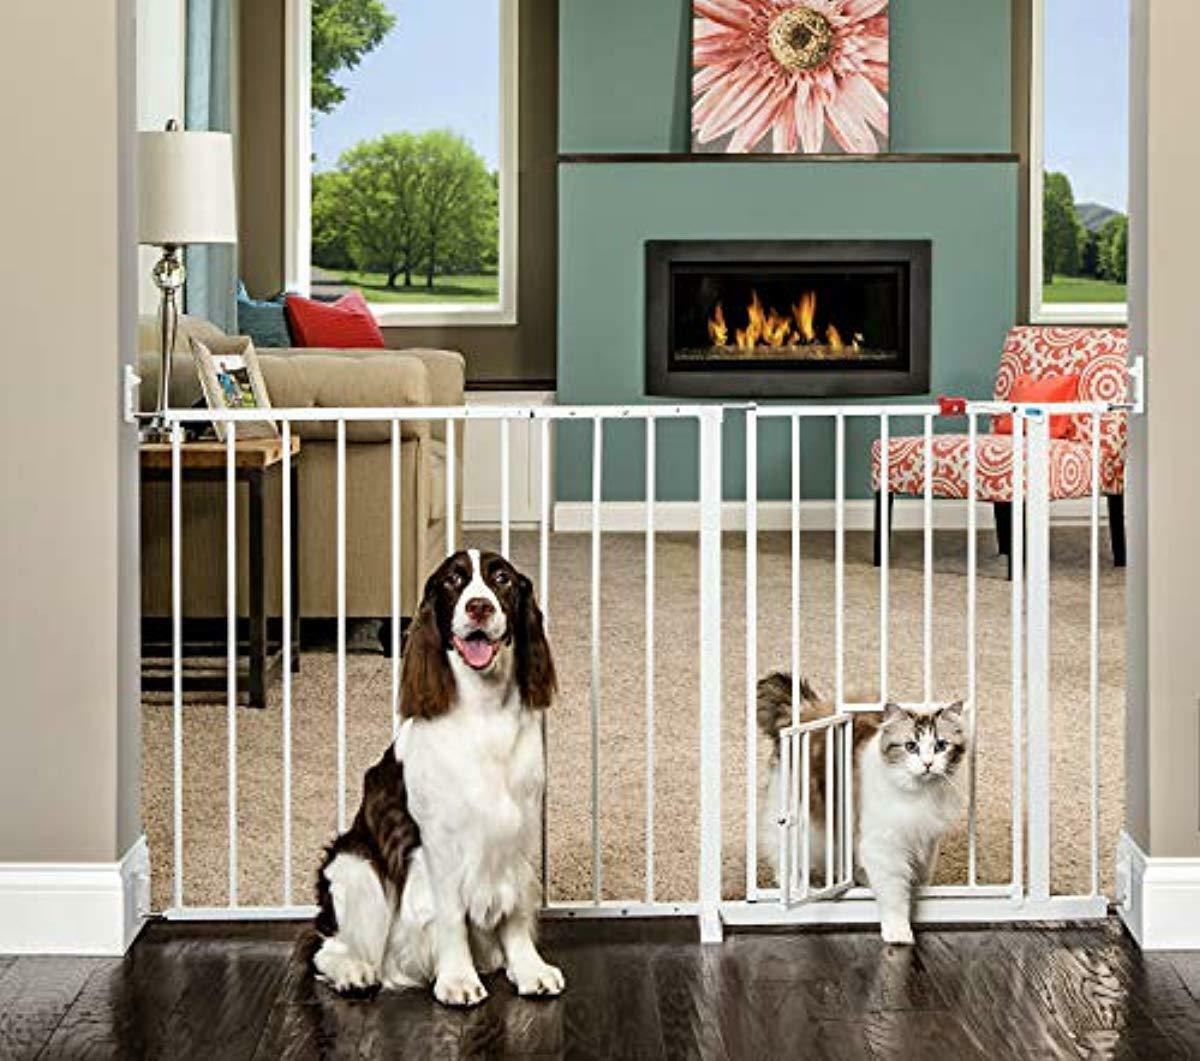 Details About Walk Through Pet Gate Baby Kids Safety Door Stair Dog Fence  Indoor Barrier 50 59